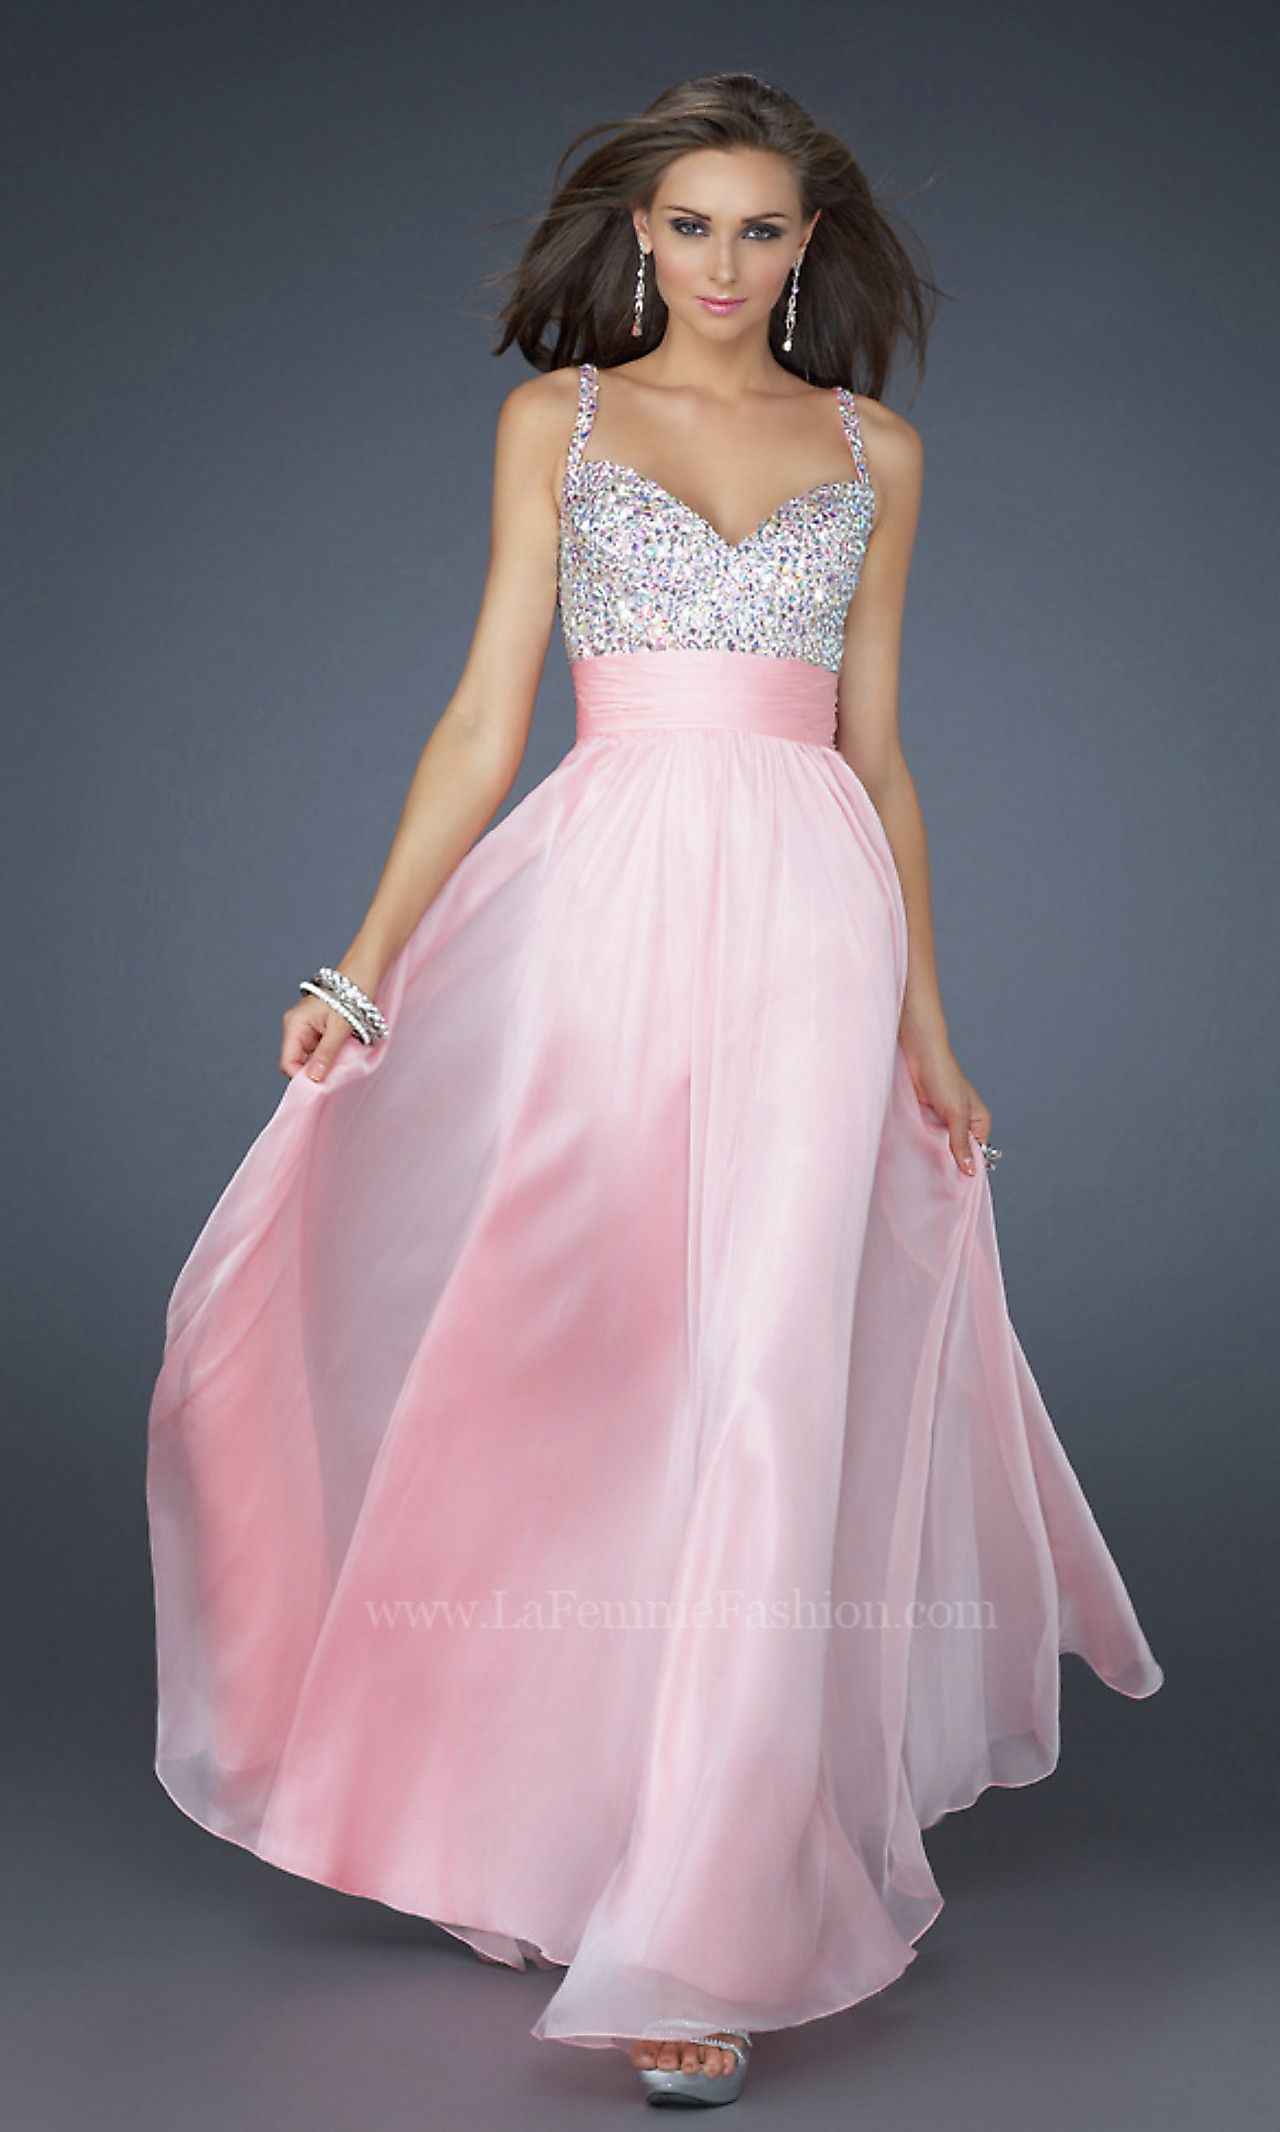 La Femme Beaded Long Formal Dress | Pinterest | Lindo, Vestiditos y ...